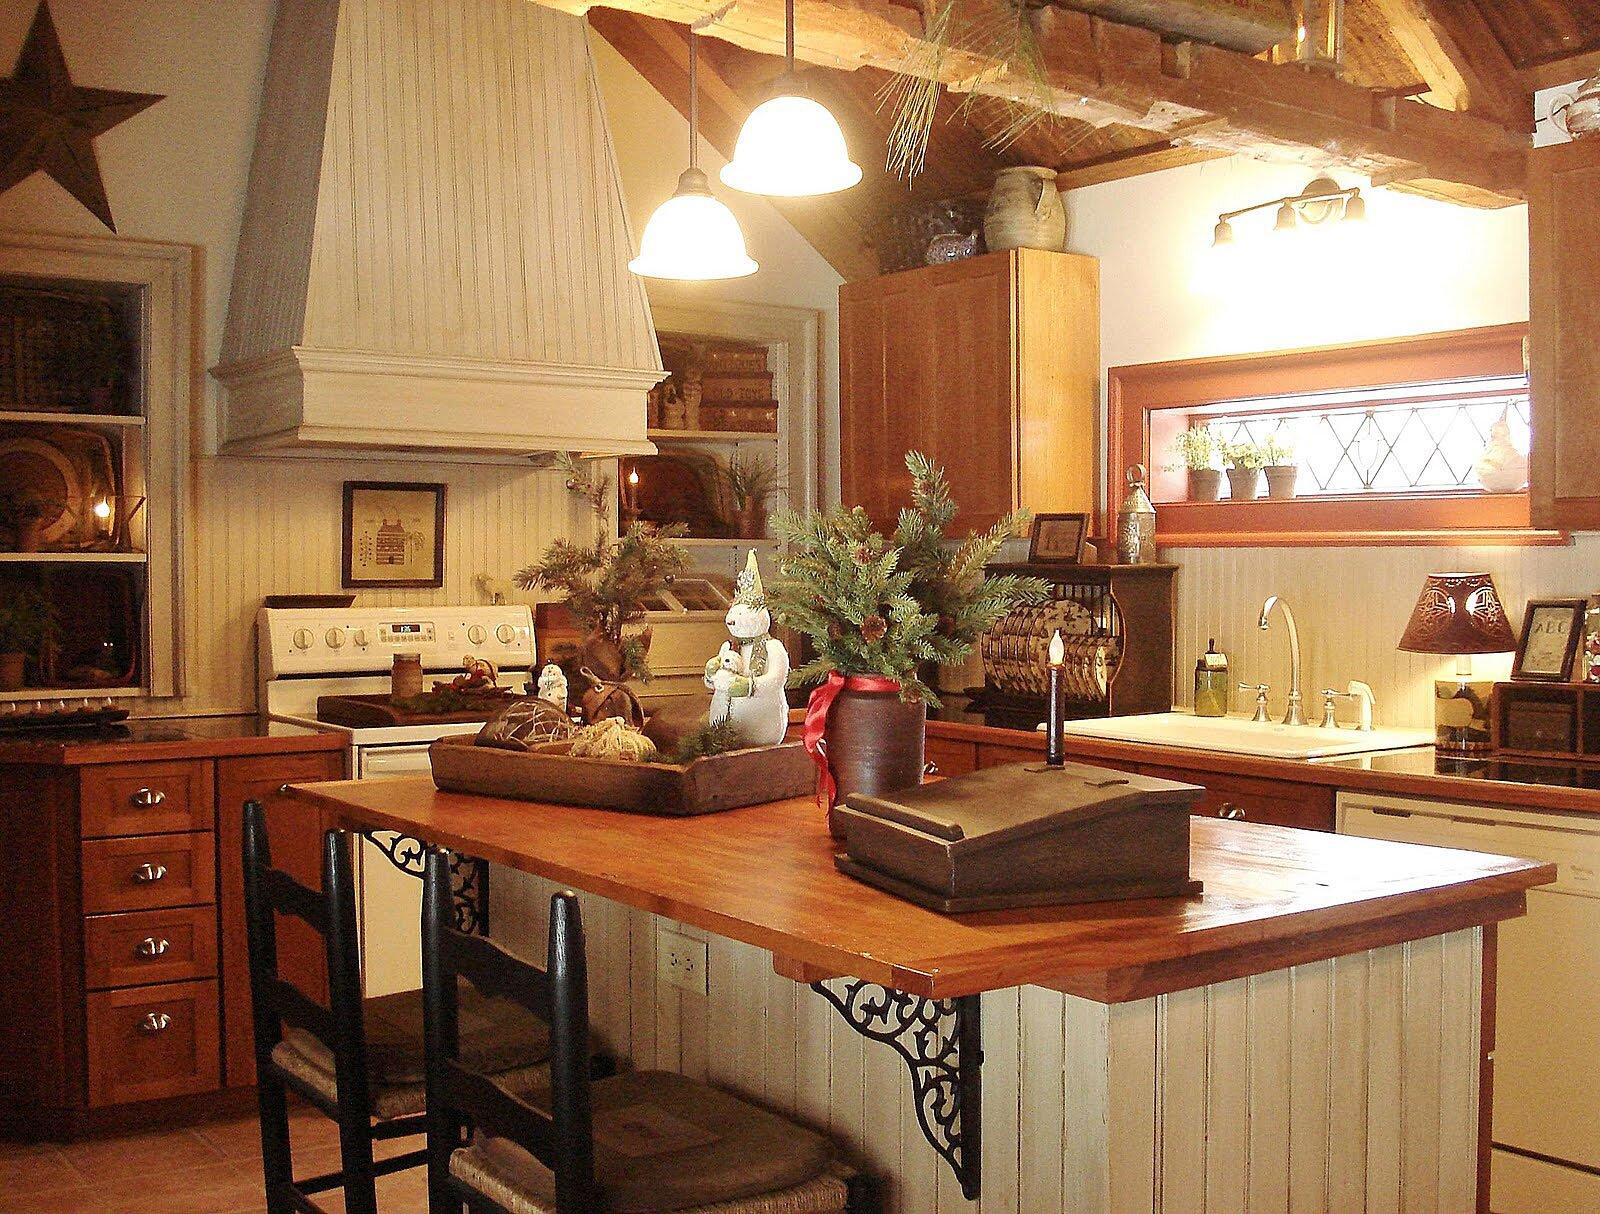 Superior Kitchen Primitive Decor. Country Primitive Home Decorating Ideas